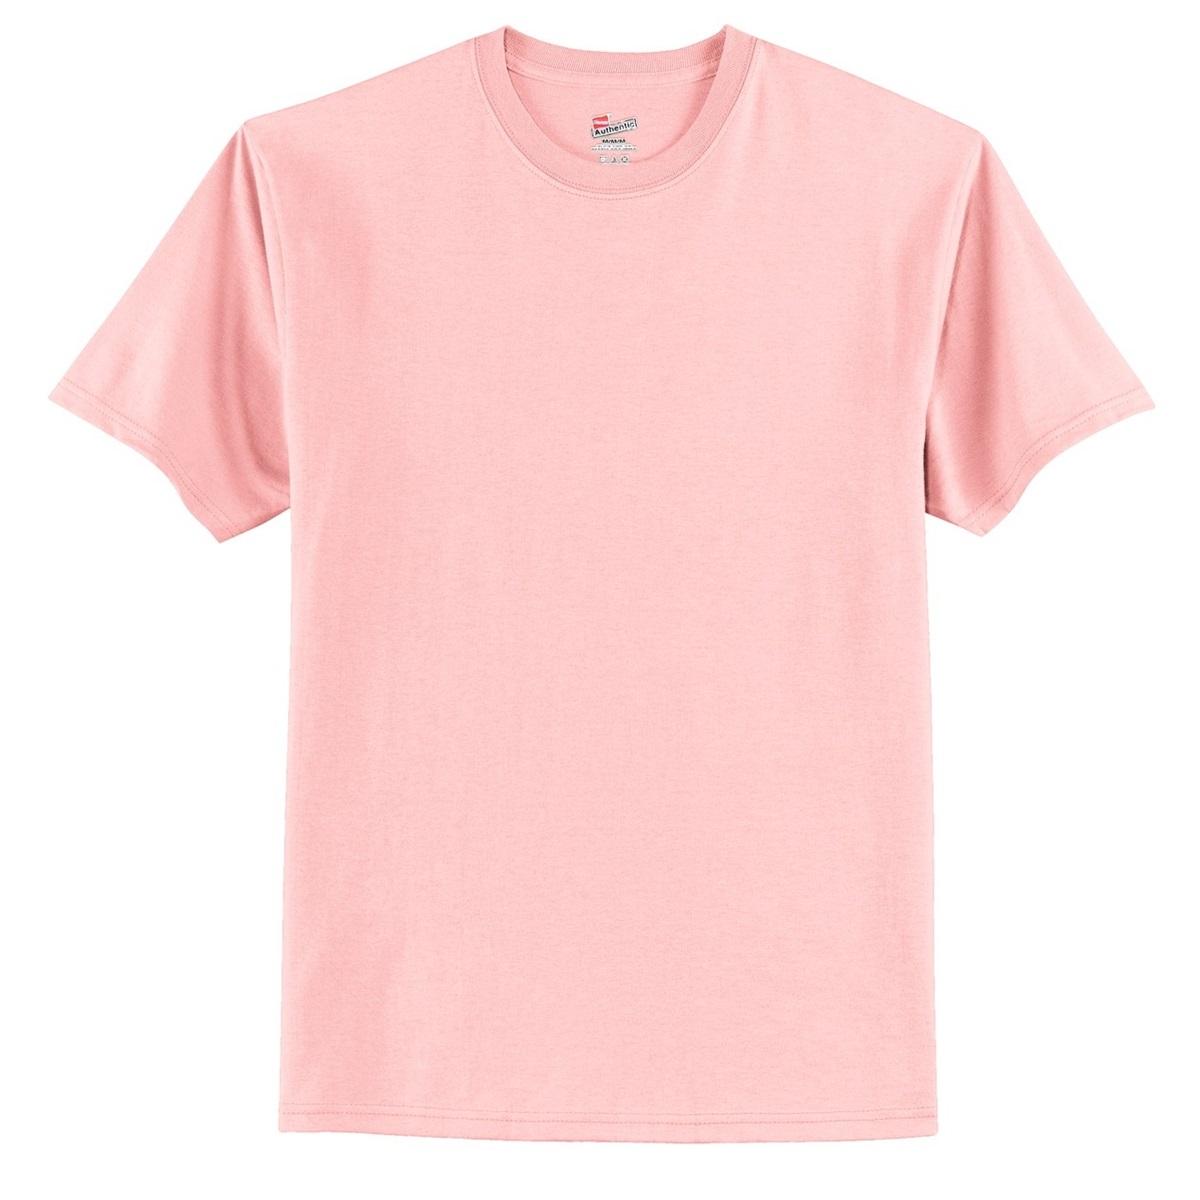 Hanes 5250 Tagless Cotton T Shirt Pale Pink